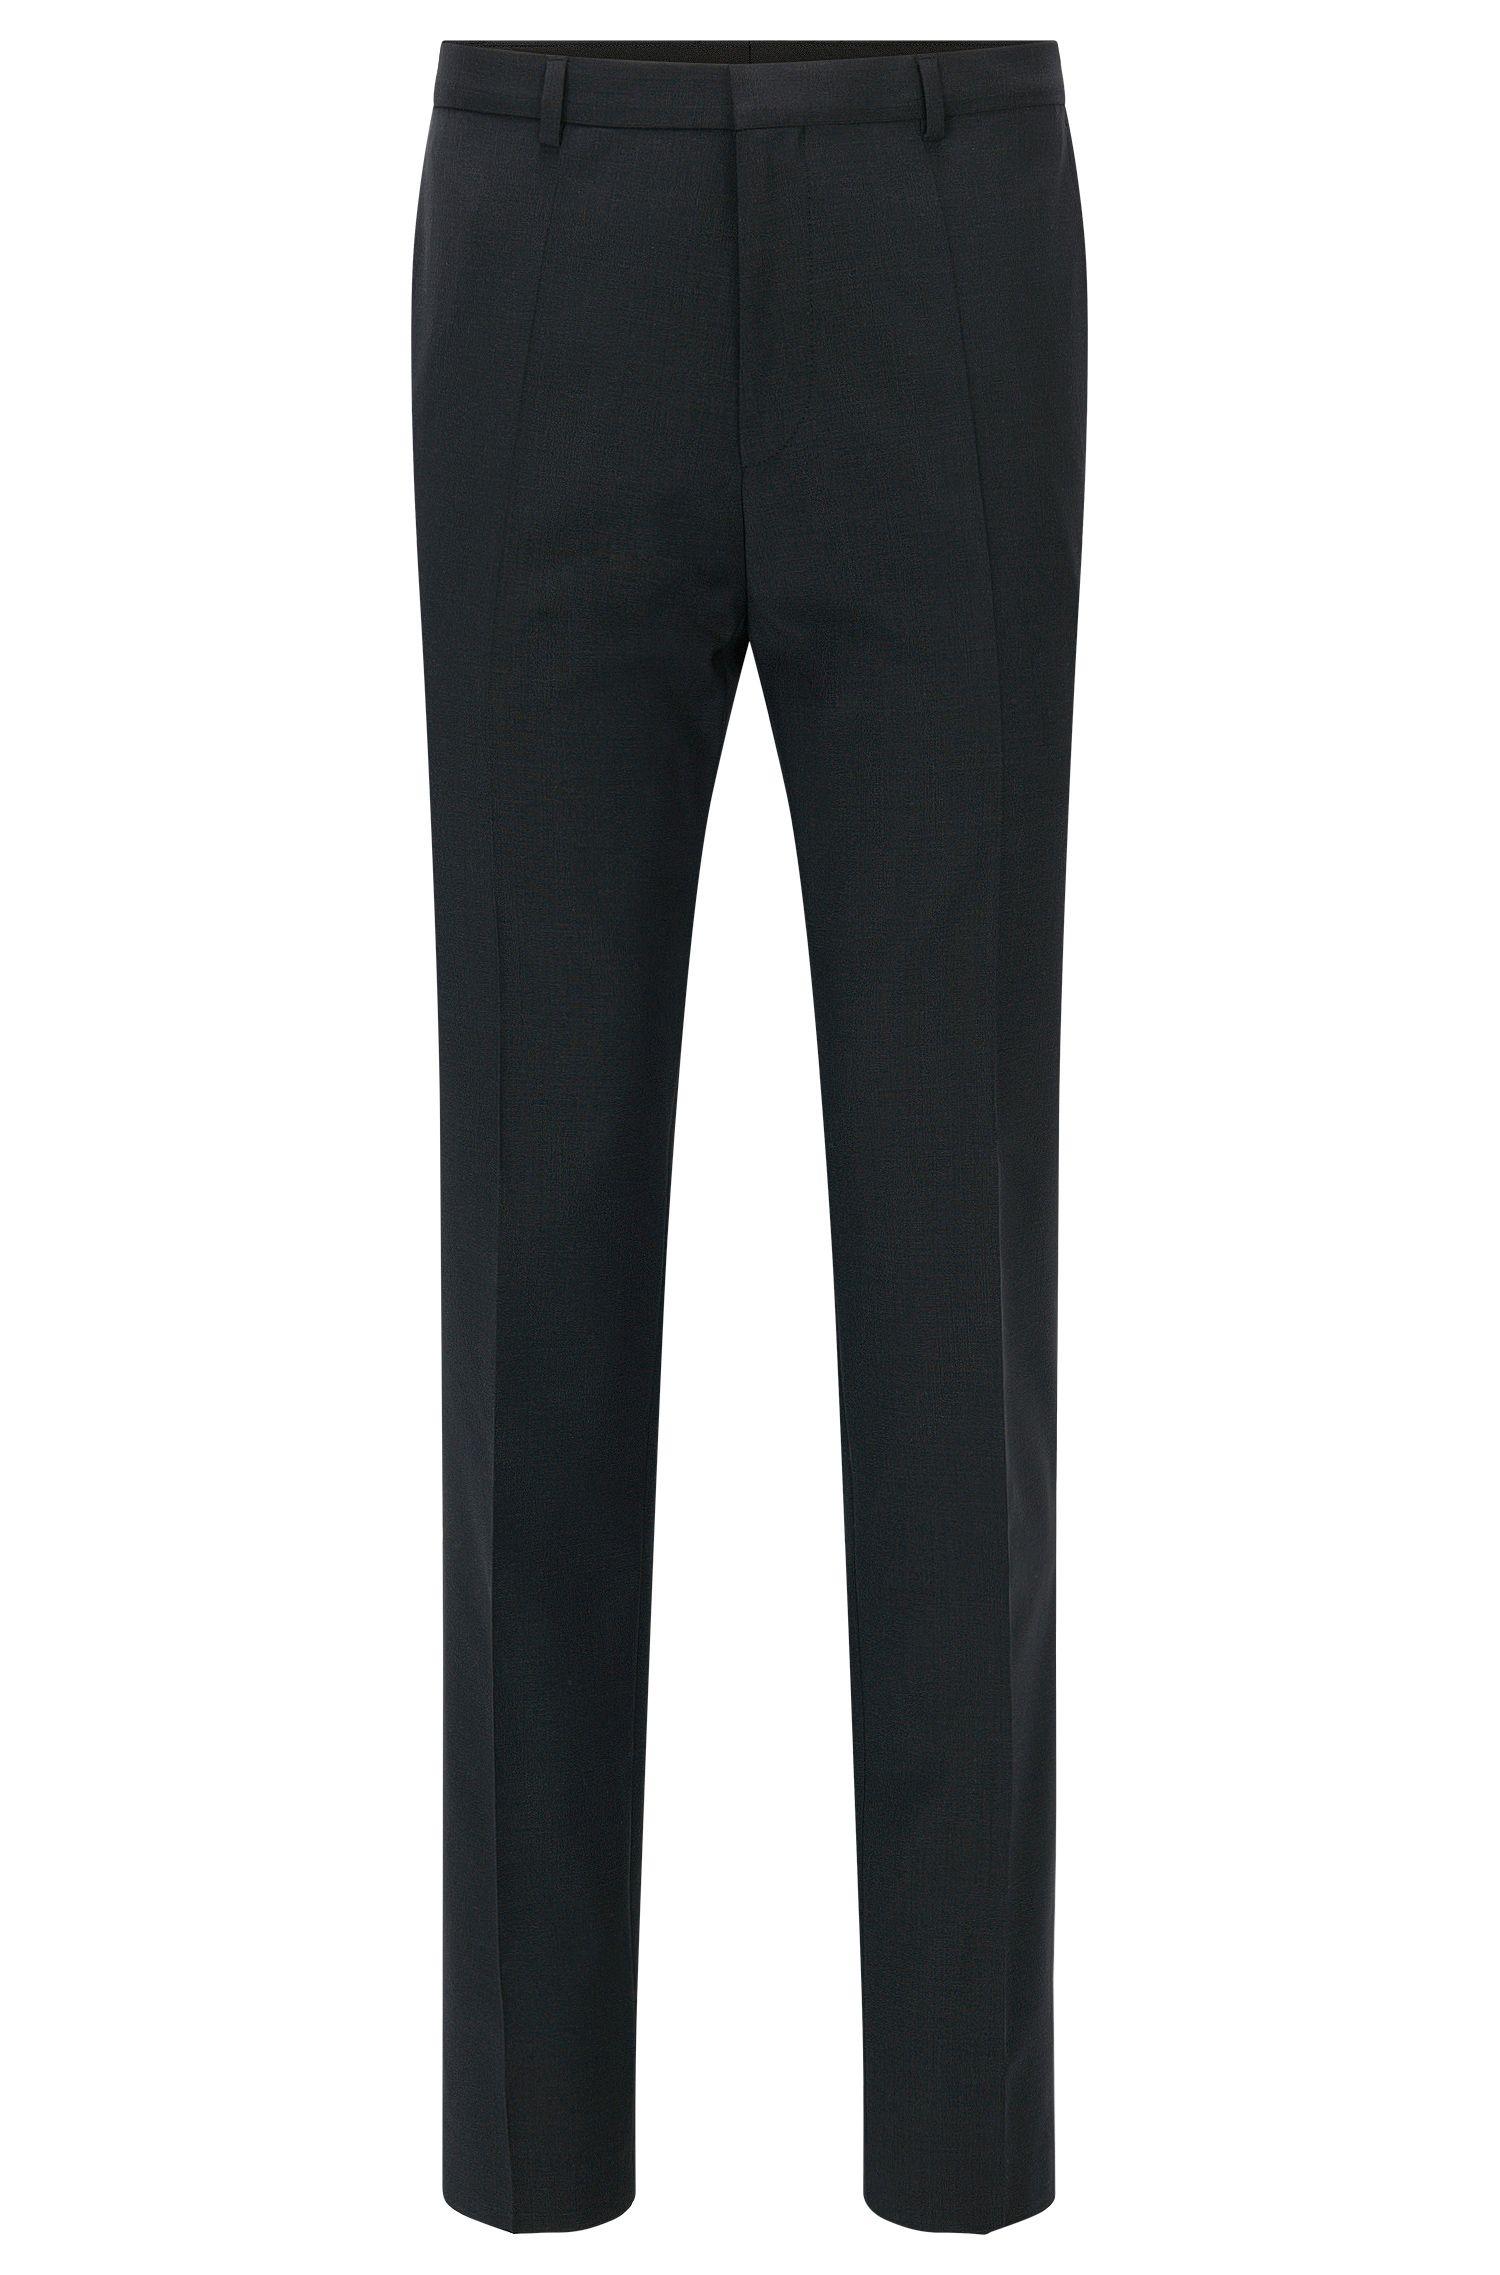 Pantalón extra slim fit en lana virgen de HUGO Hombre